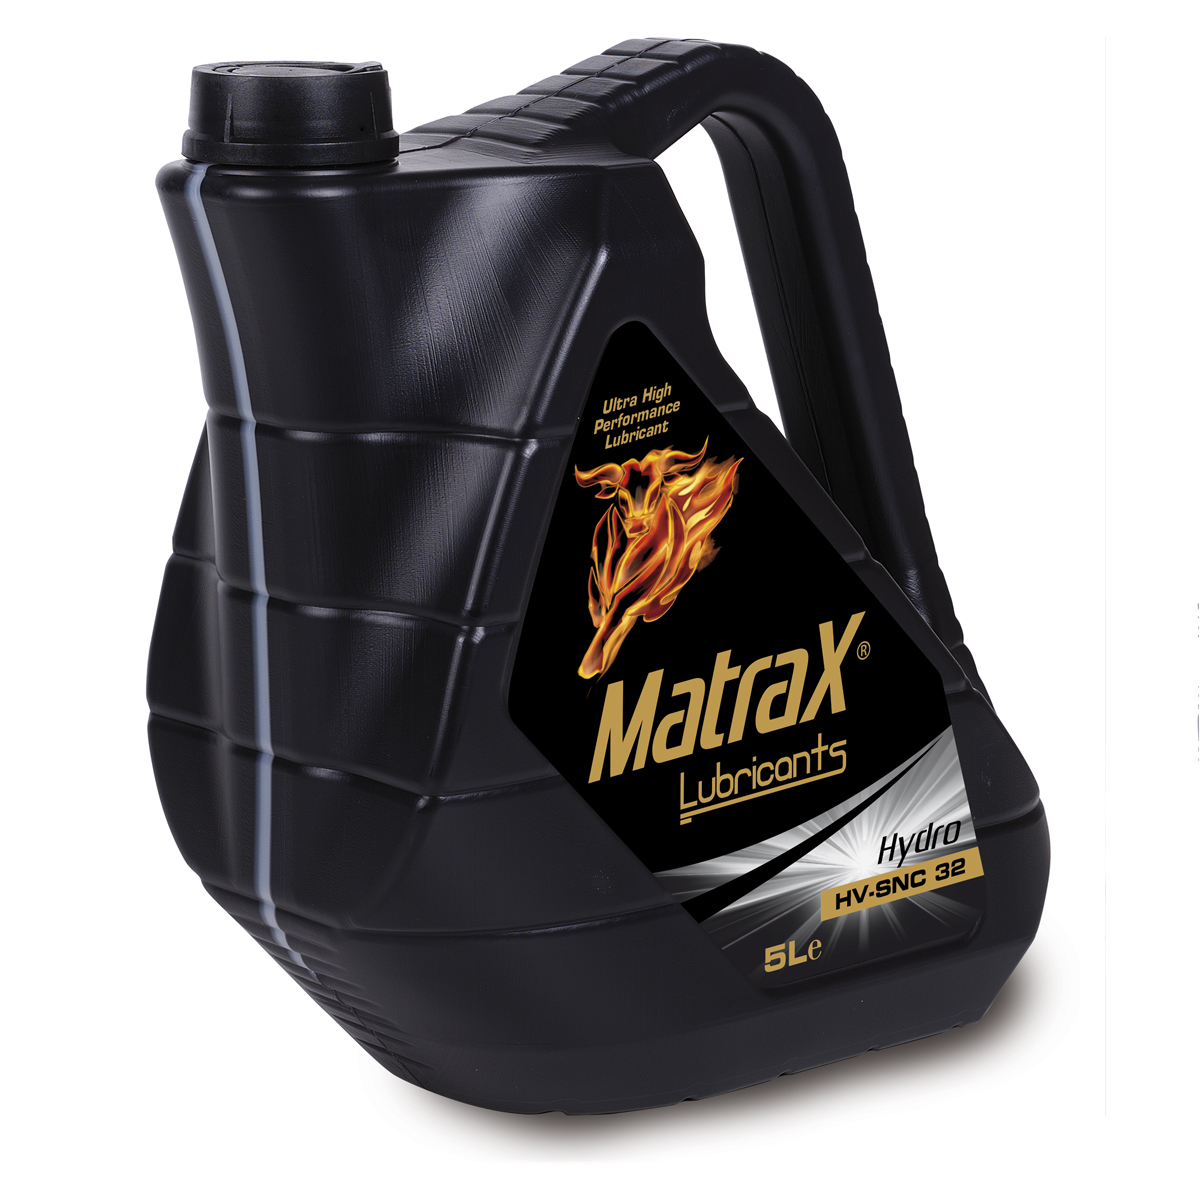 MatraX Hydro HV-SNC 32